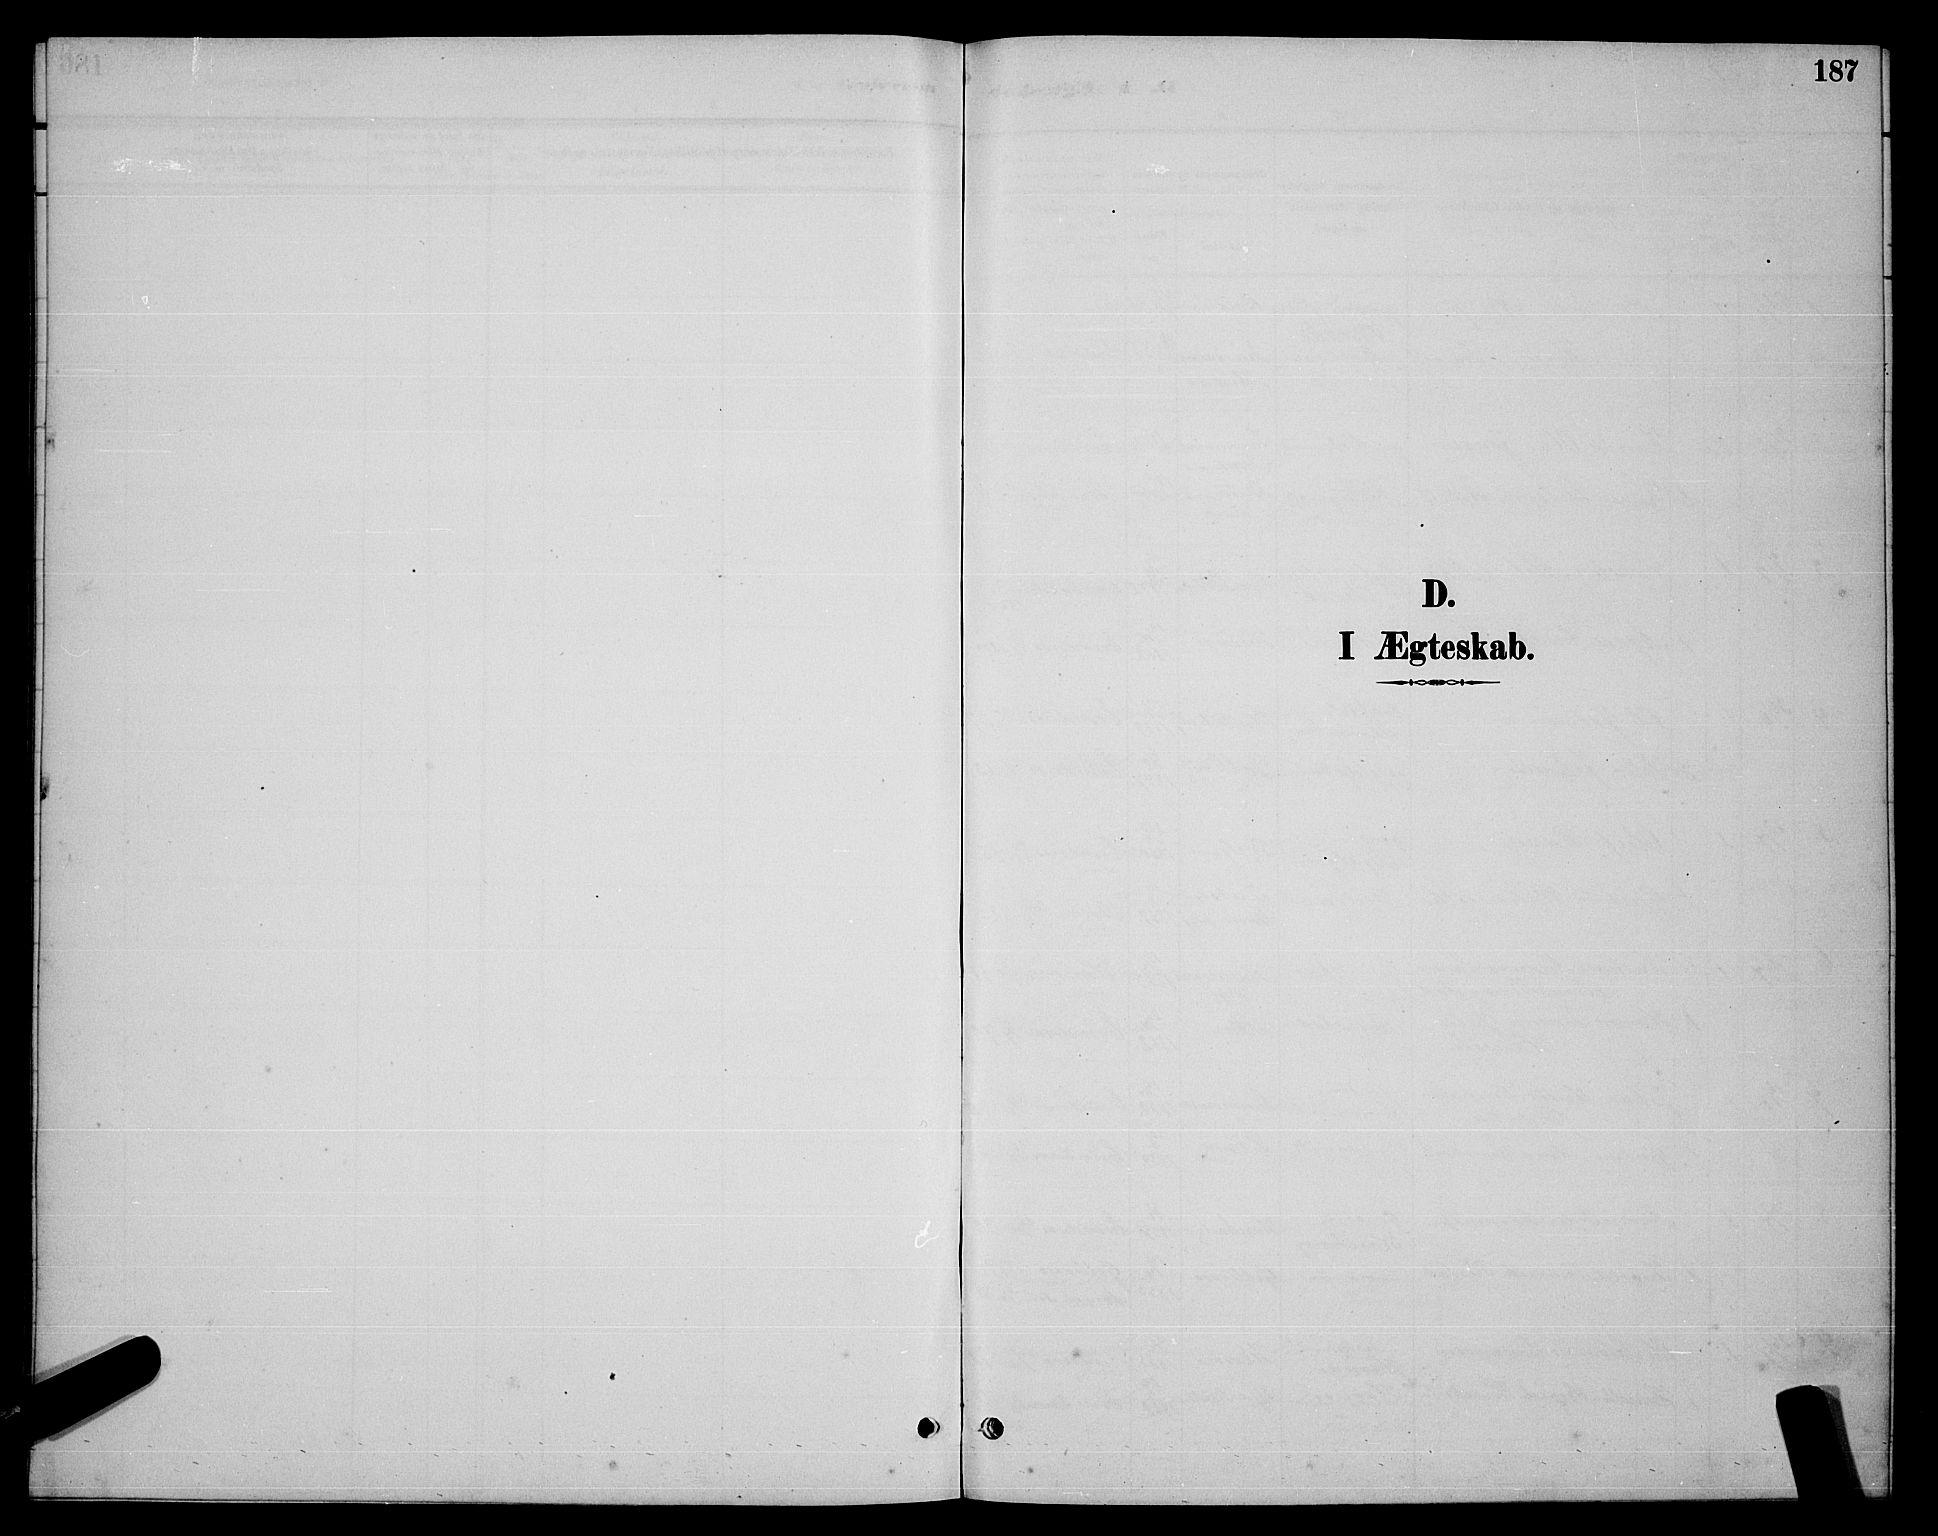 SAT, Ministerialprotokoller, klokkerbøker og fødselsregistre - Nordland, 863/L0914: Klokkerbok nr. 863C04, 1886-1897, s. 187